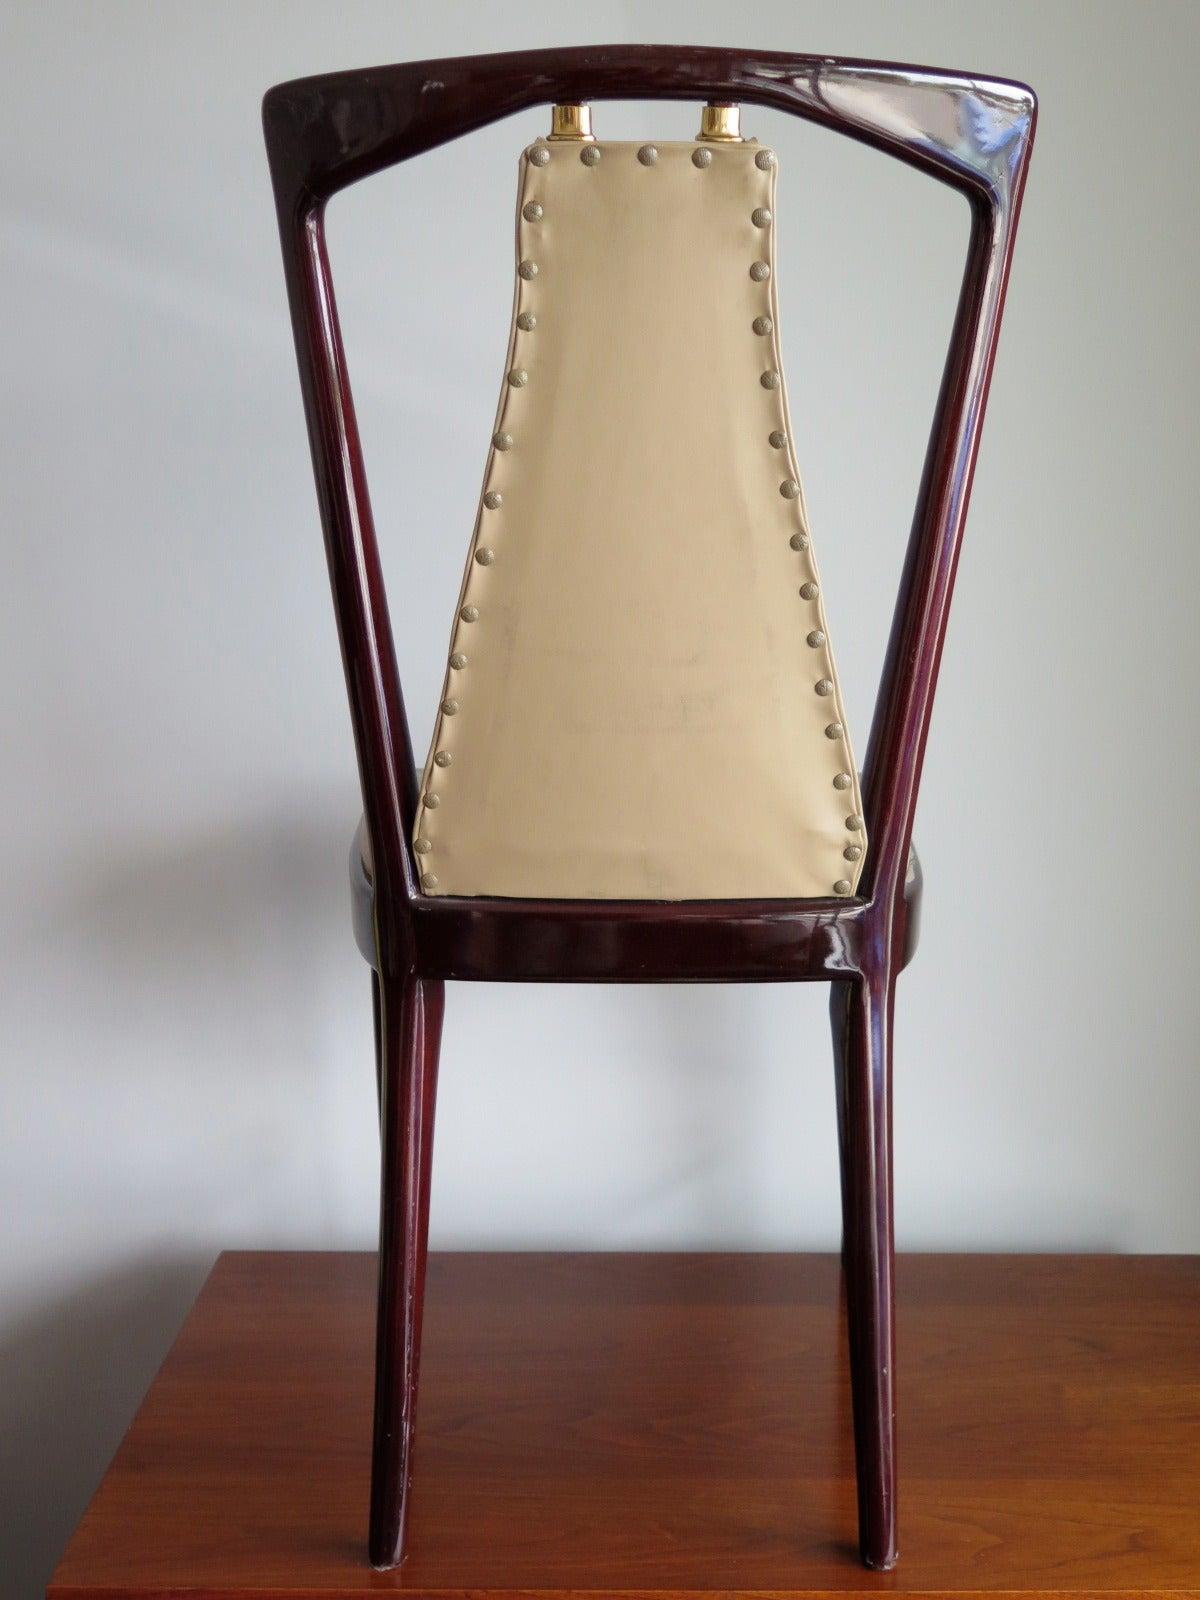 Set of 12 Elegant Chairs in the style of Osvaldo Borsani For Sale 2